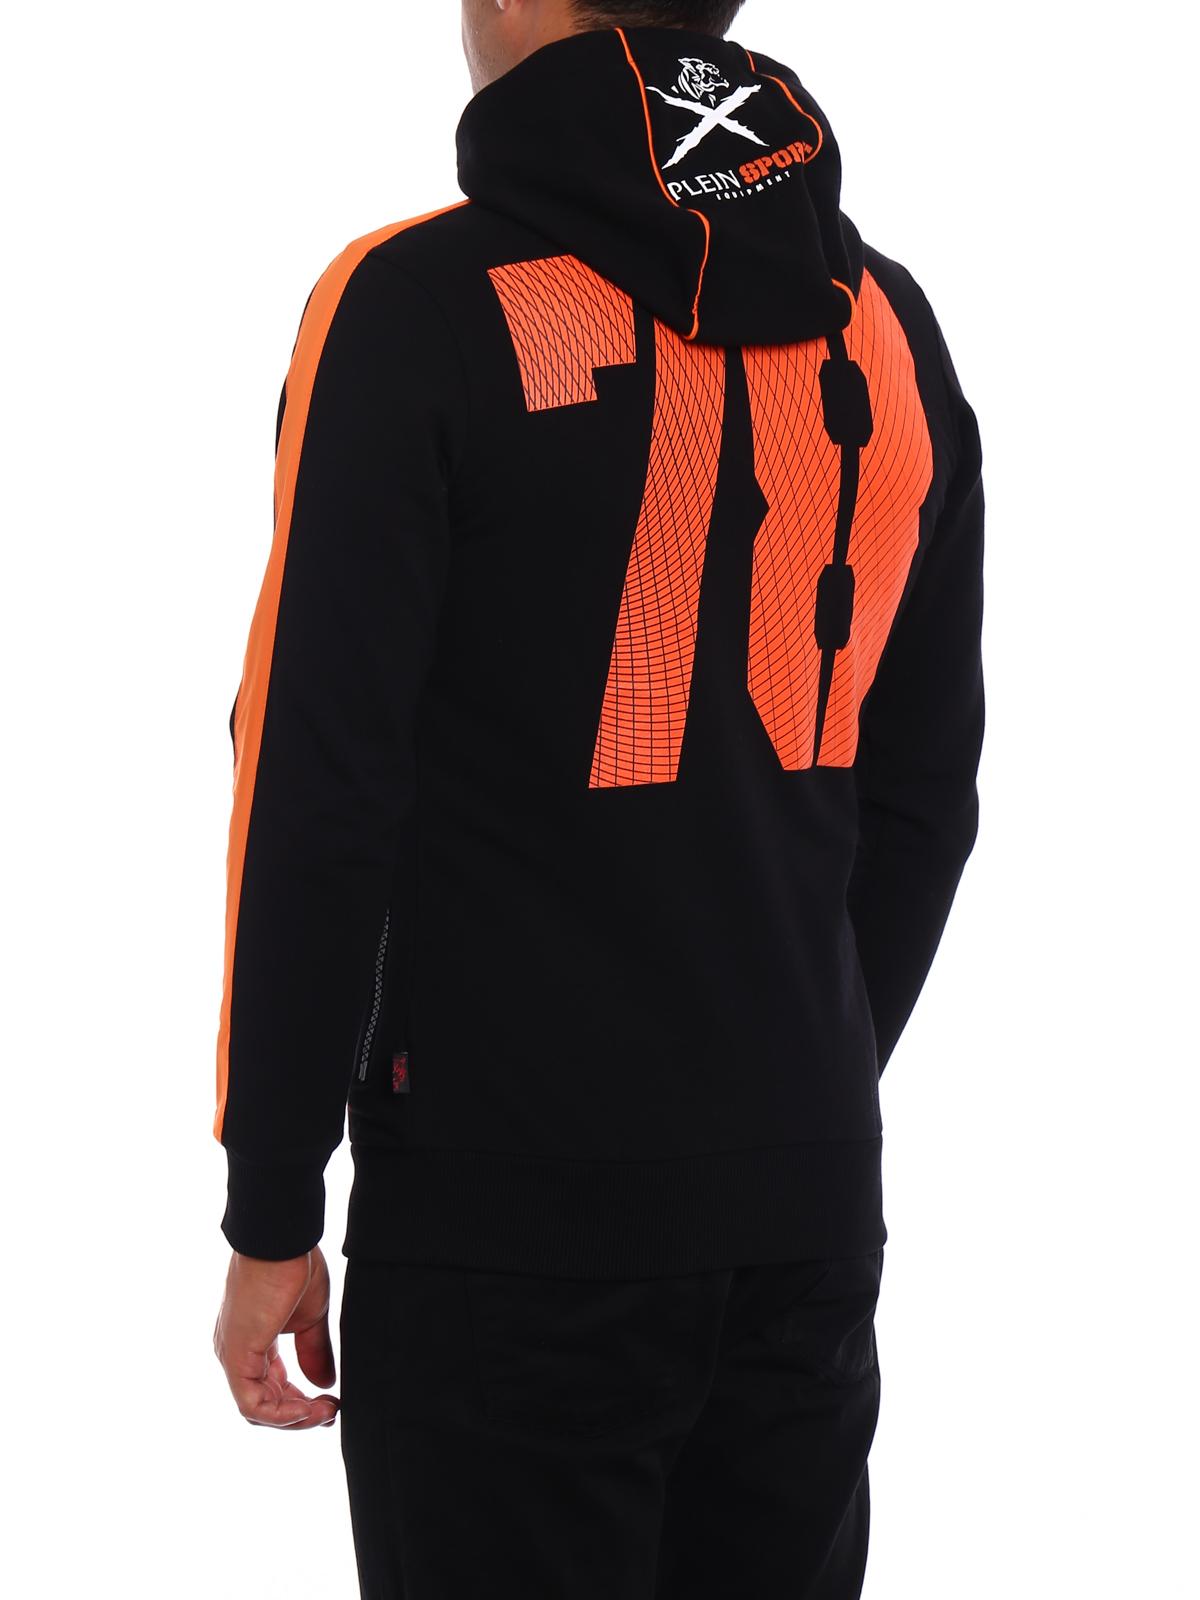 run hooded sweat jacket by philipp plein sweatshirts sweaters shop online at. Black Bedroom Furniture Sets. Home Design Ideas